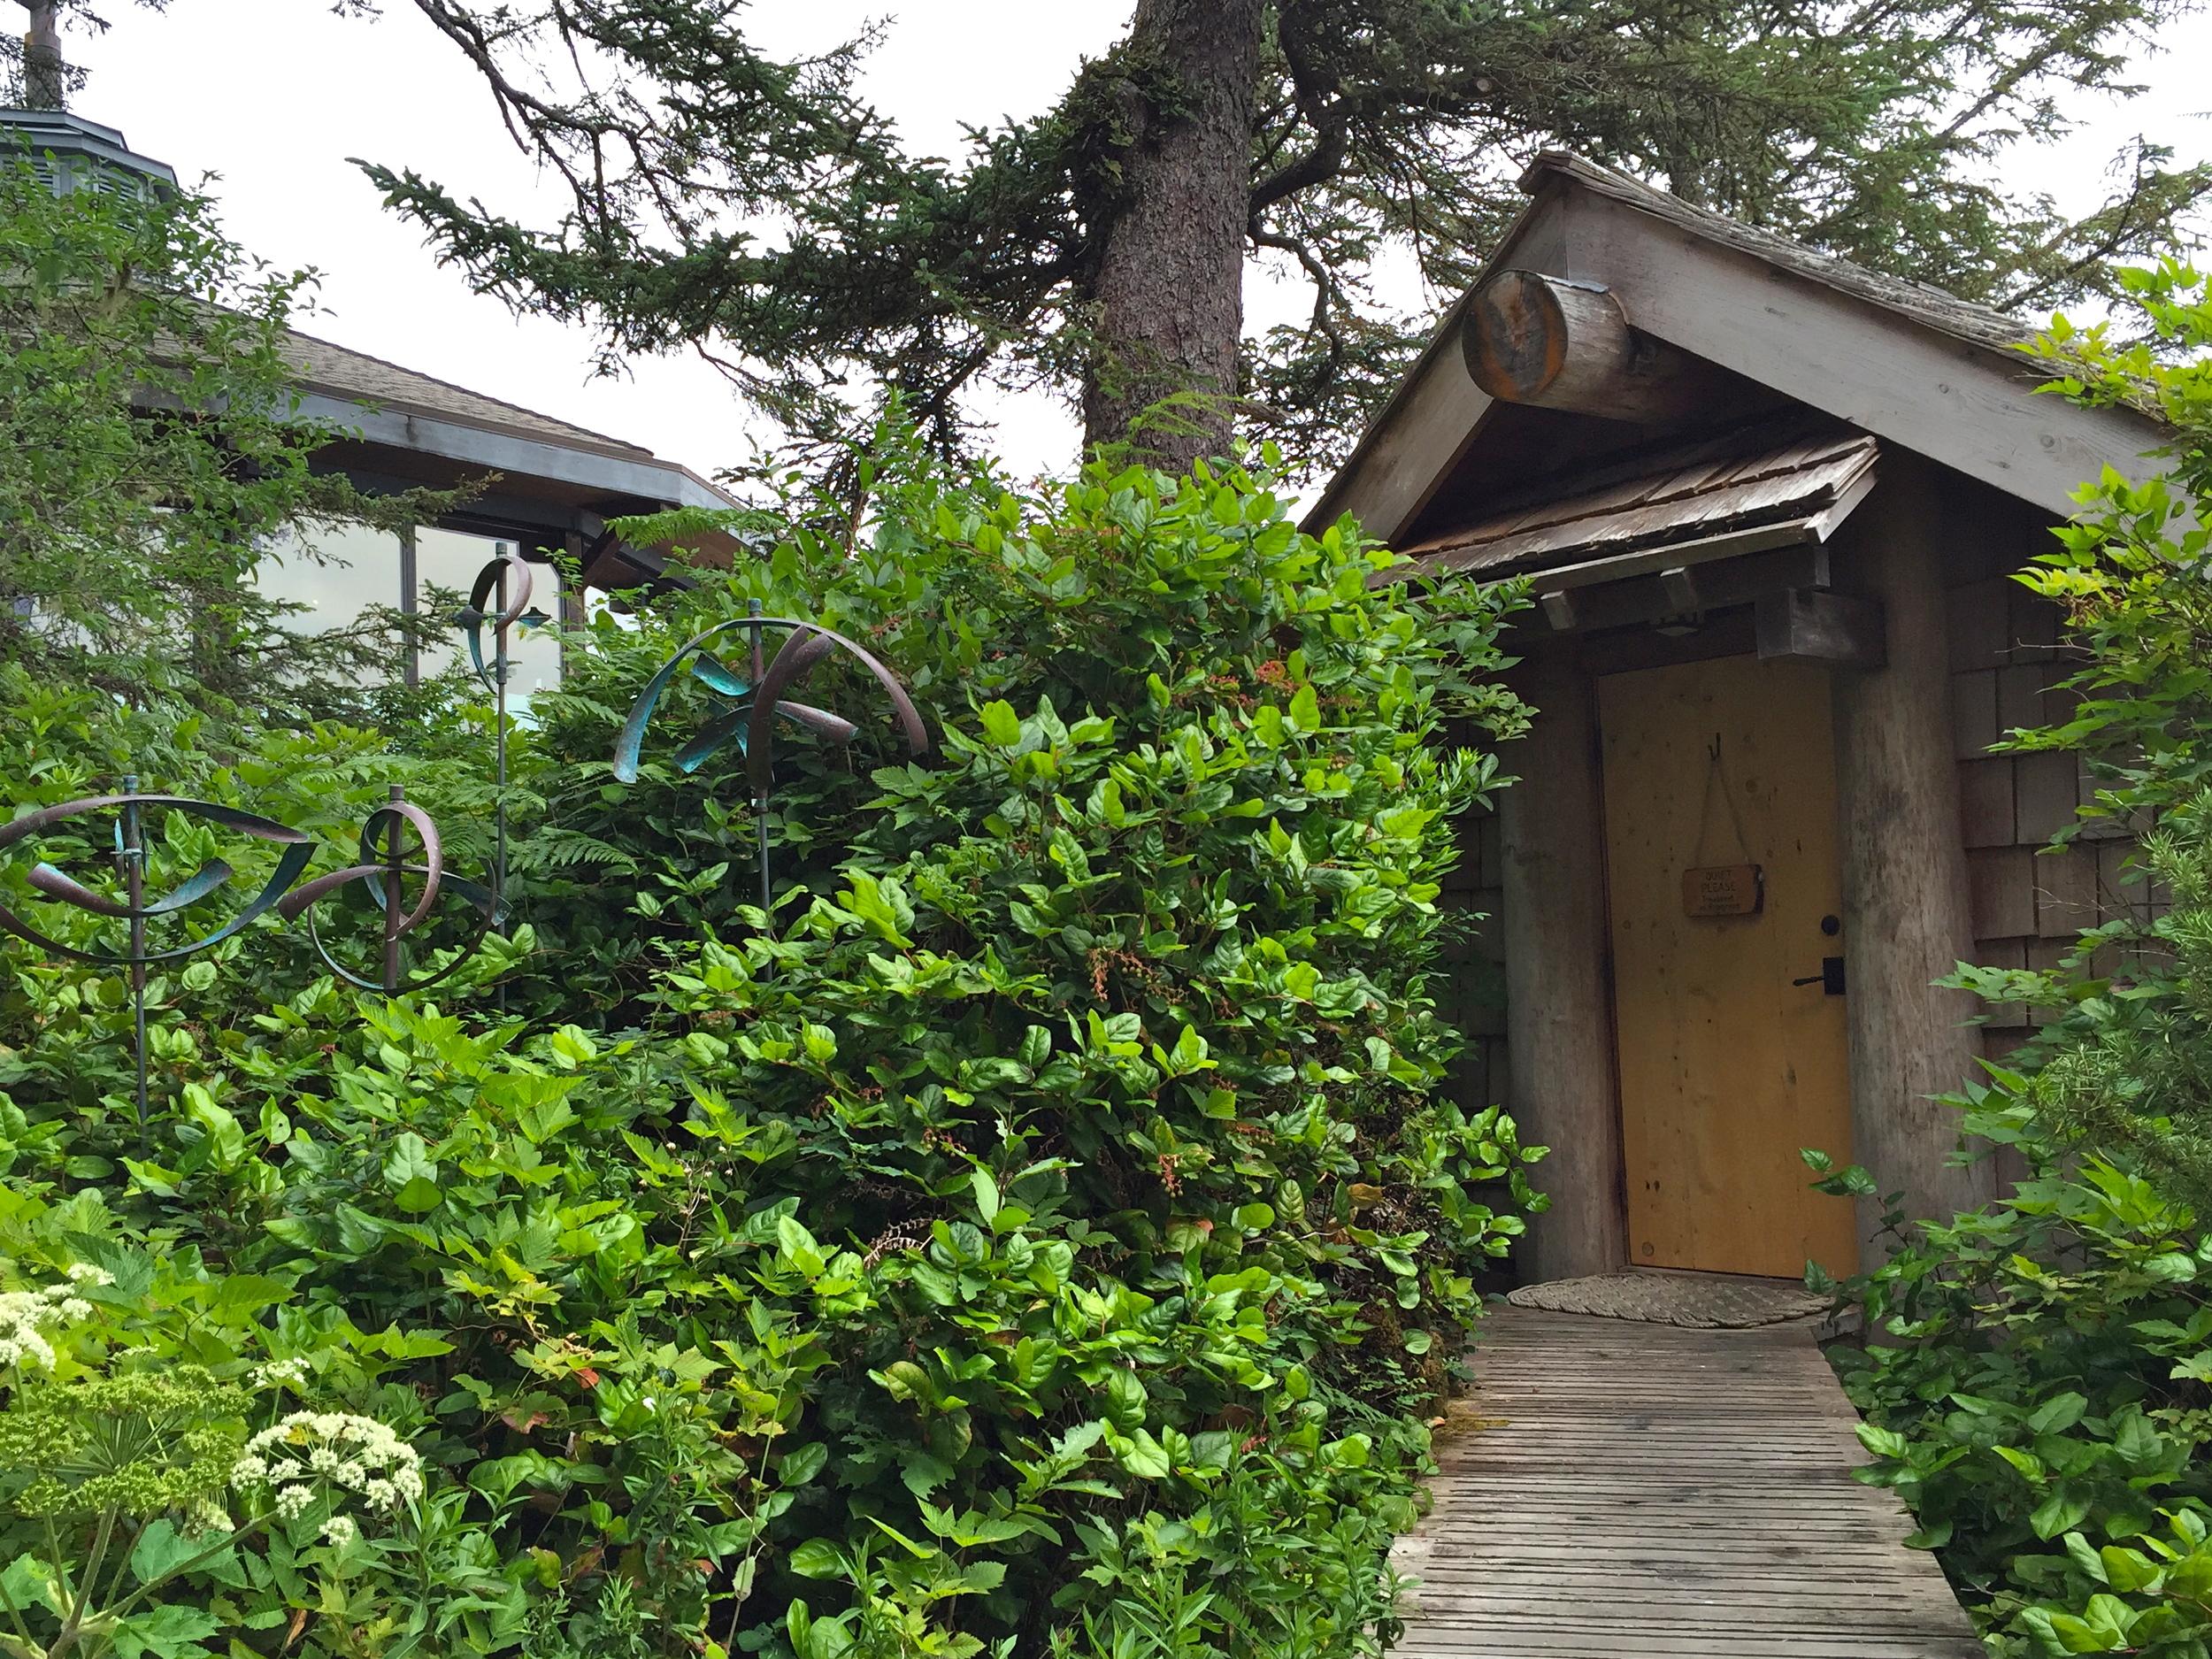 Cedar sanctuary beach cabin. Ancient Cedars Spa, Wickaninnish Inn, Tofino, BC, Canada.